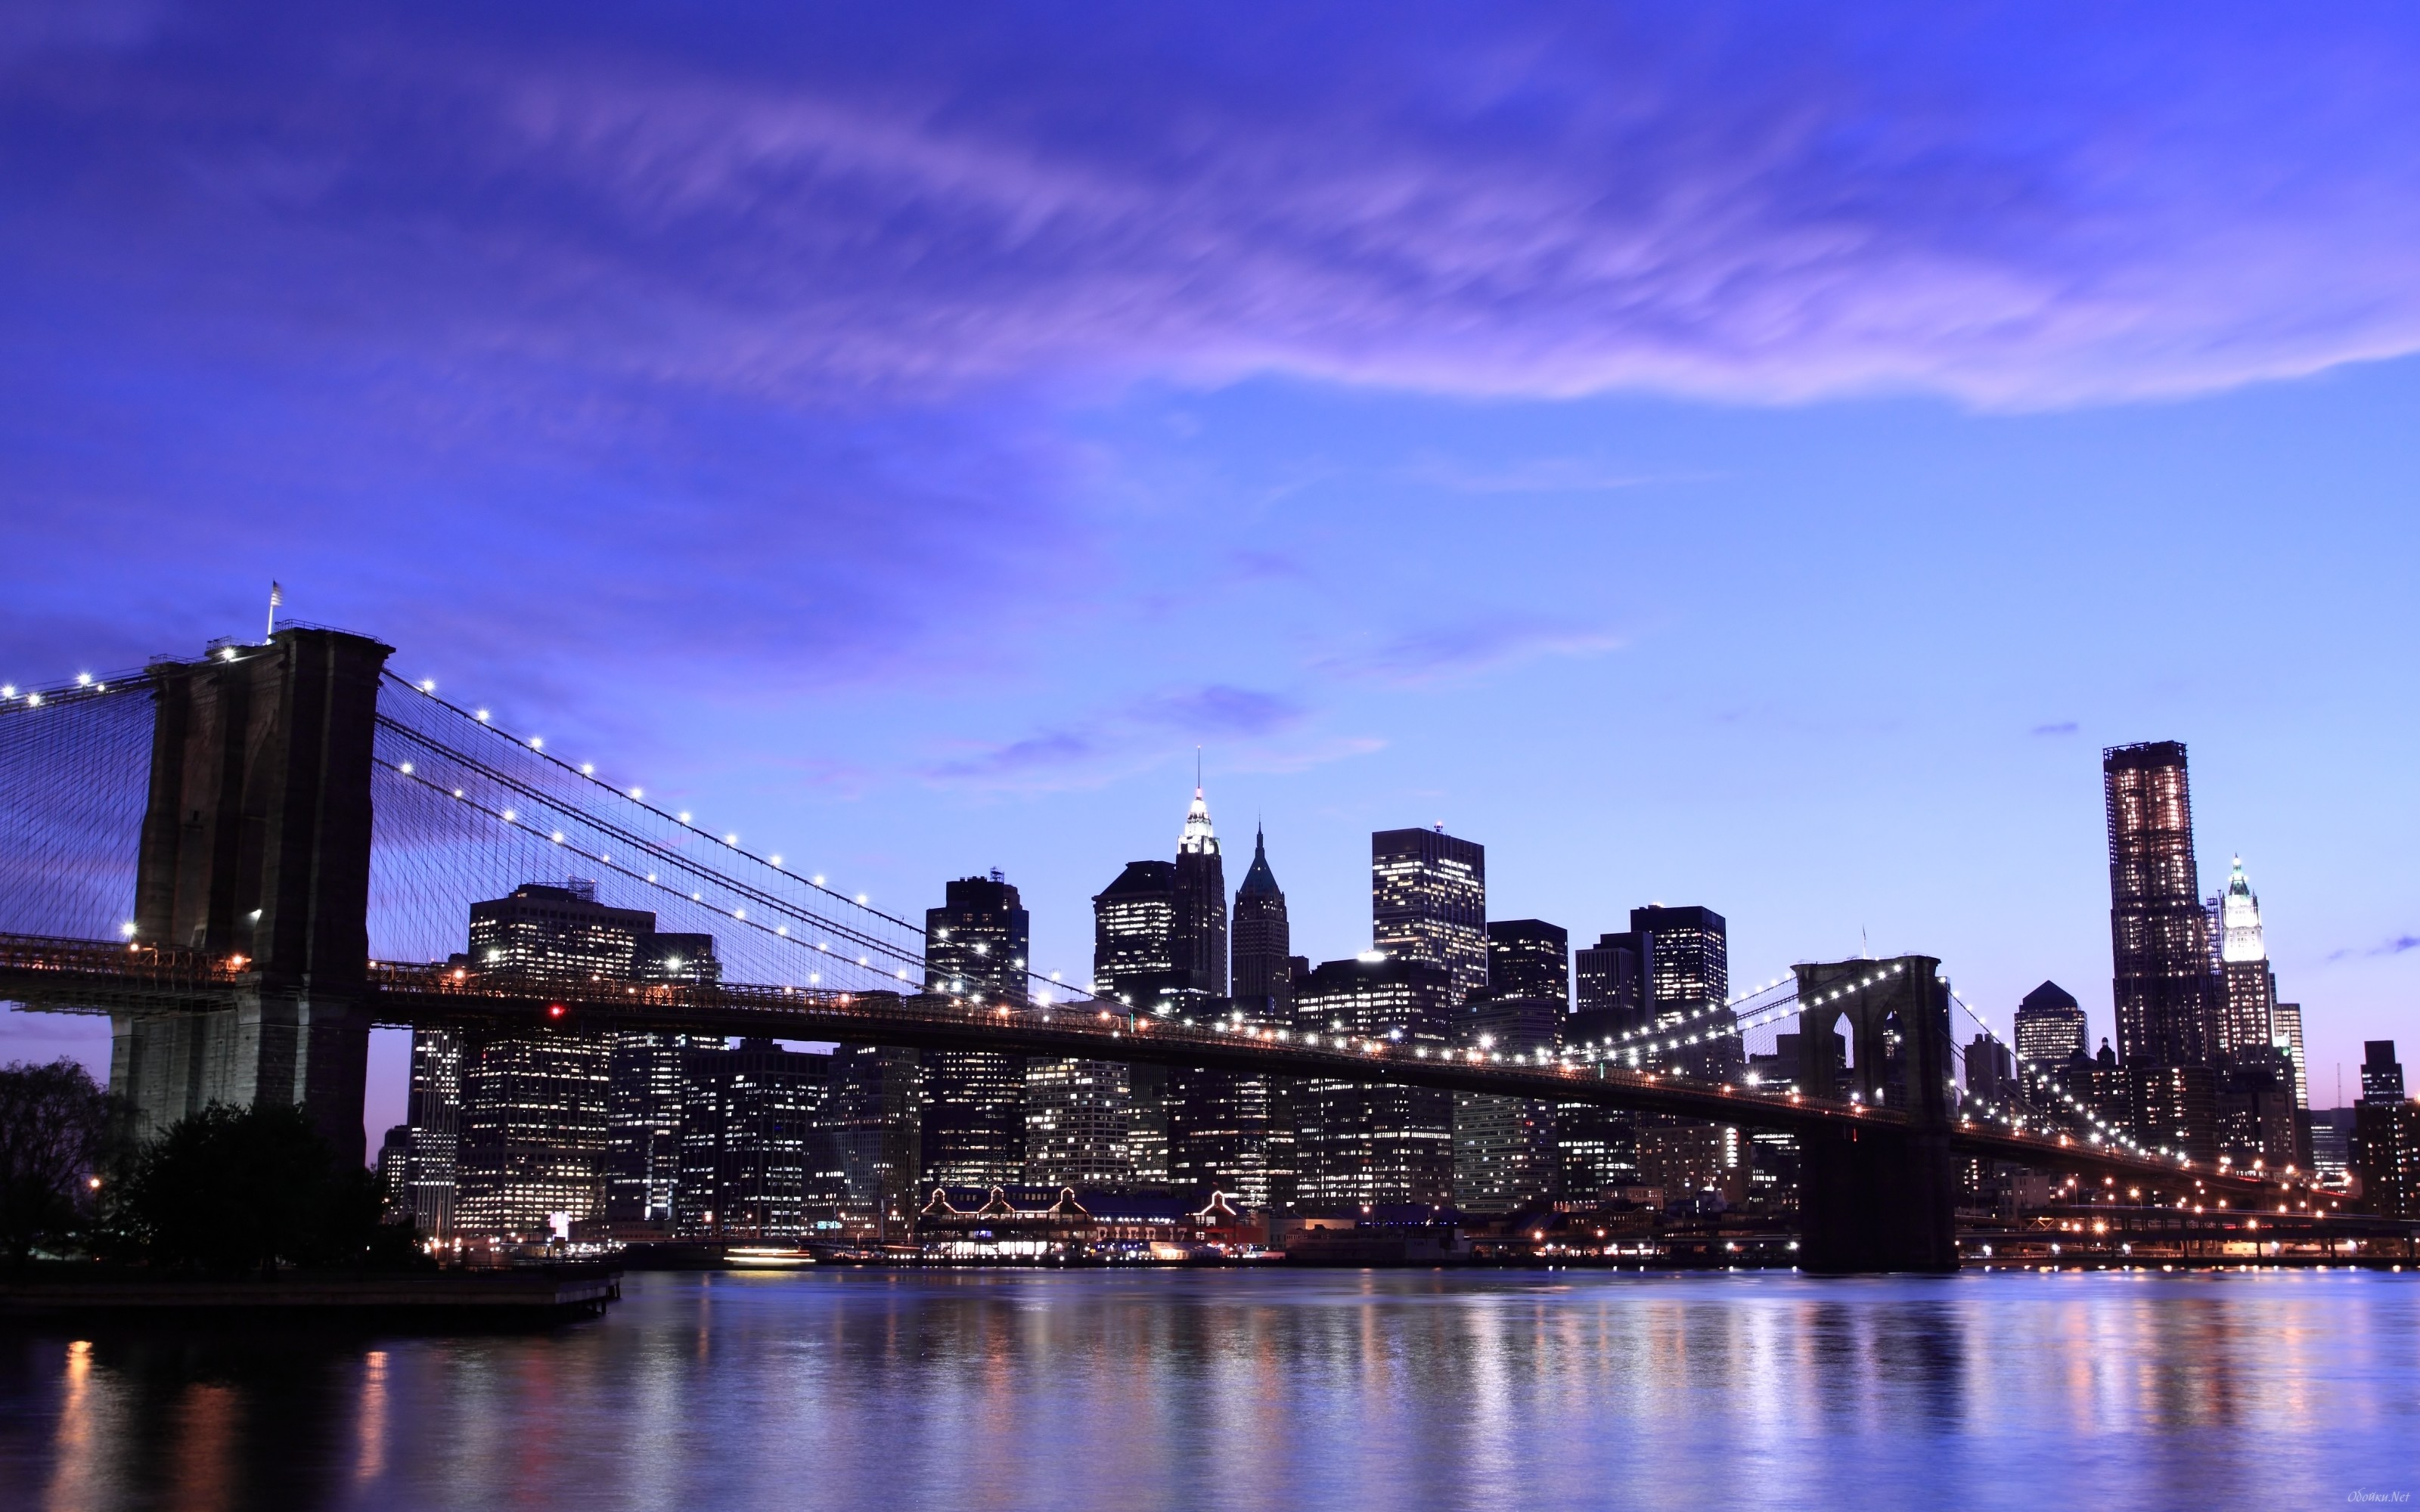 New york desktop background 60 images for Immagini desktop new york